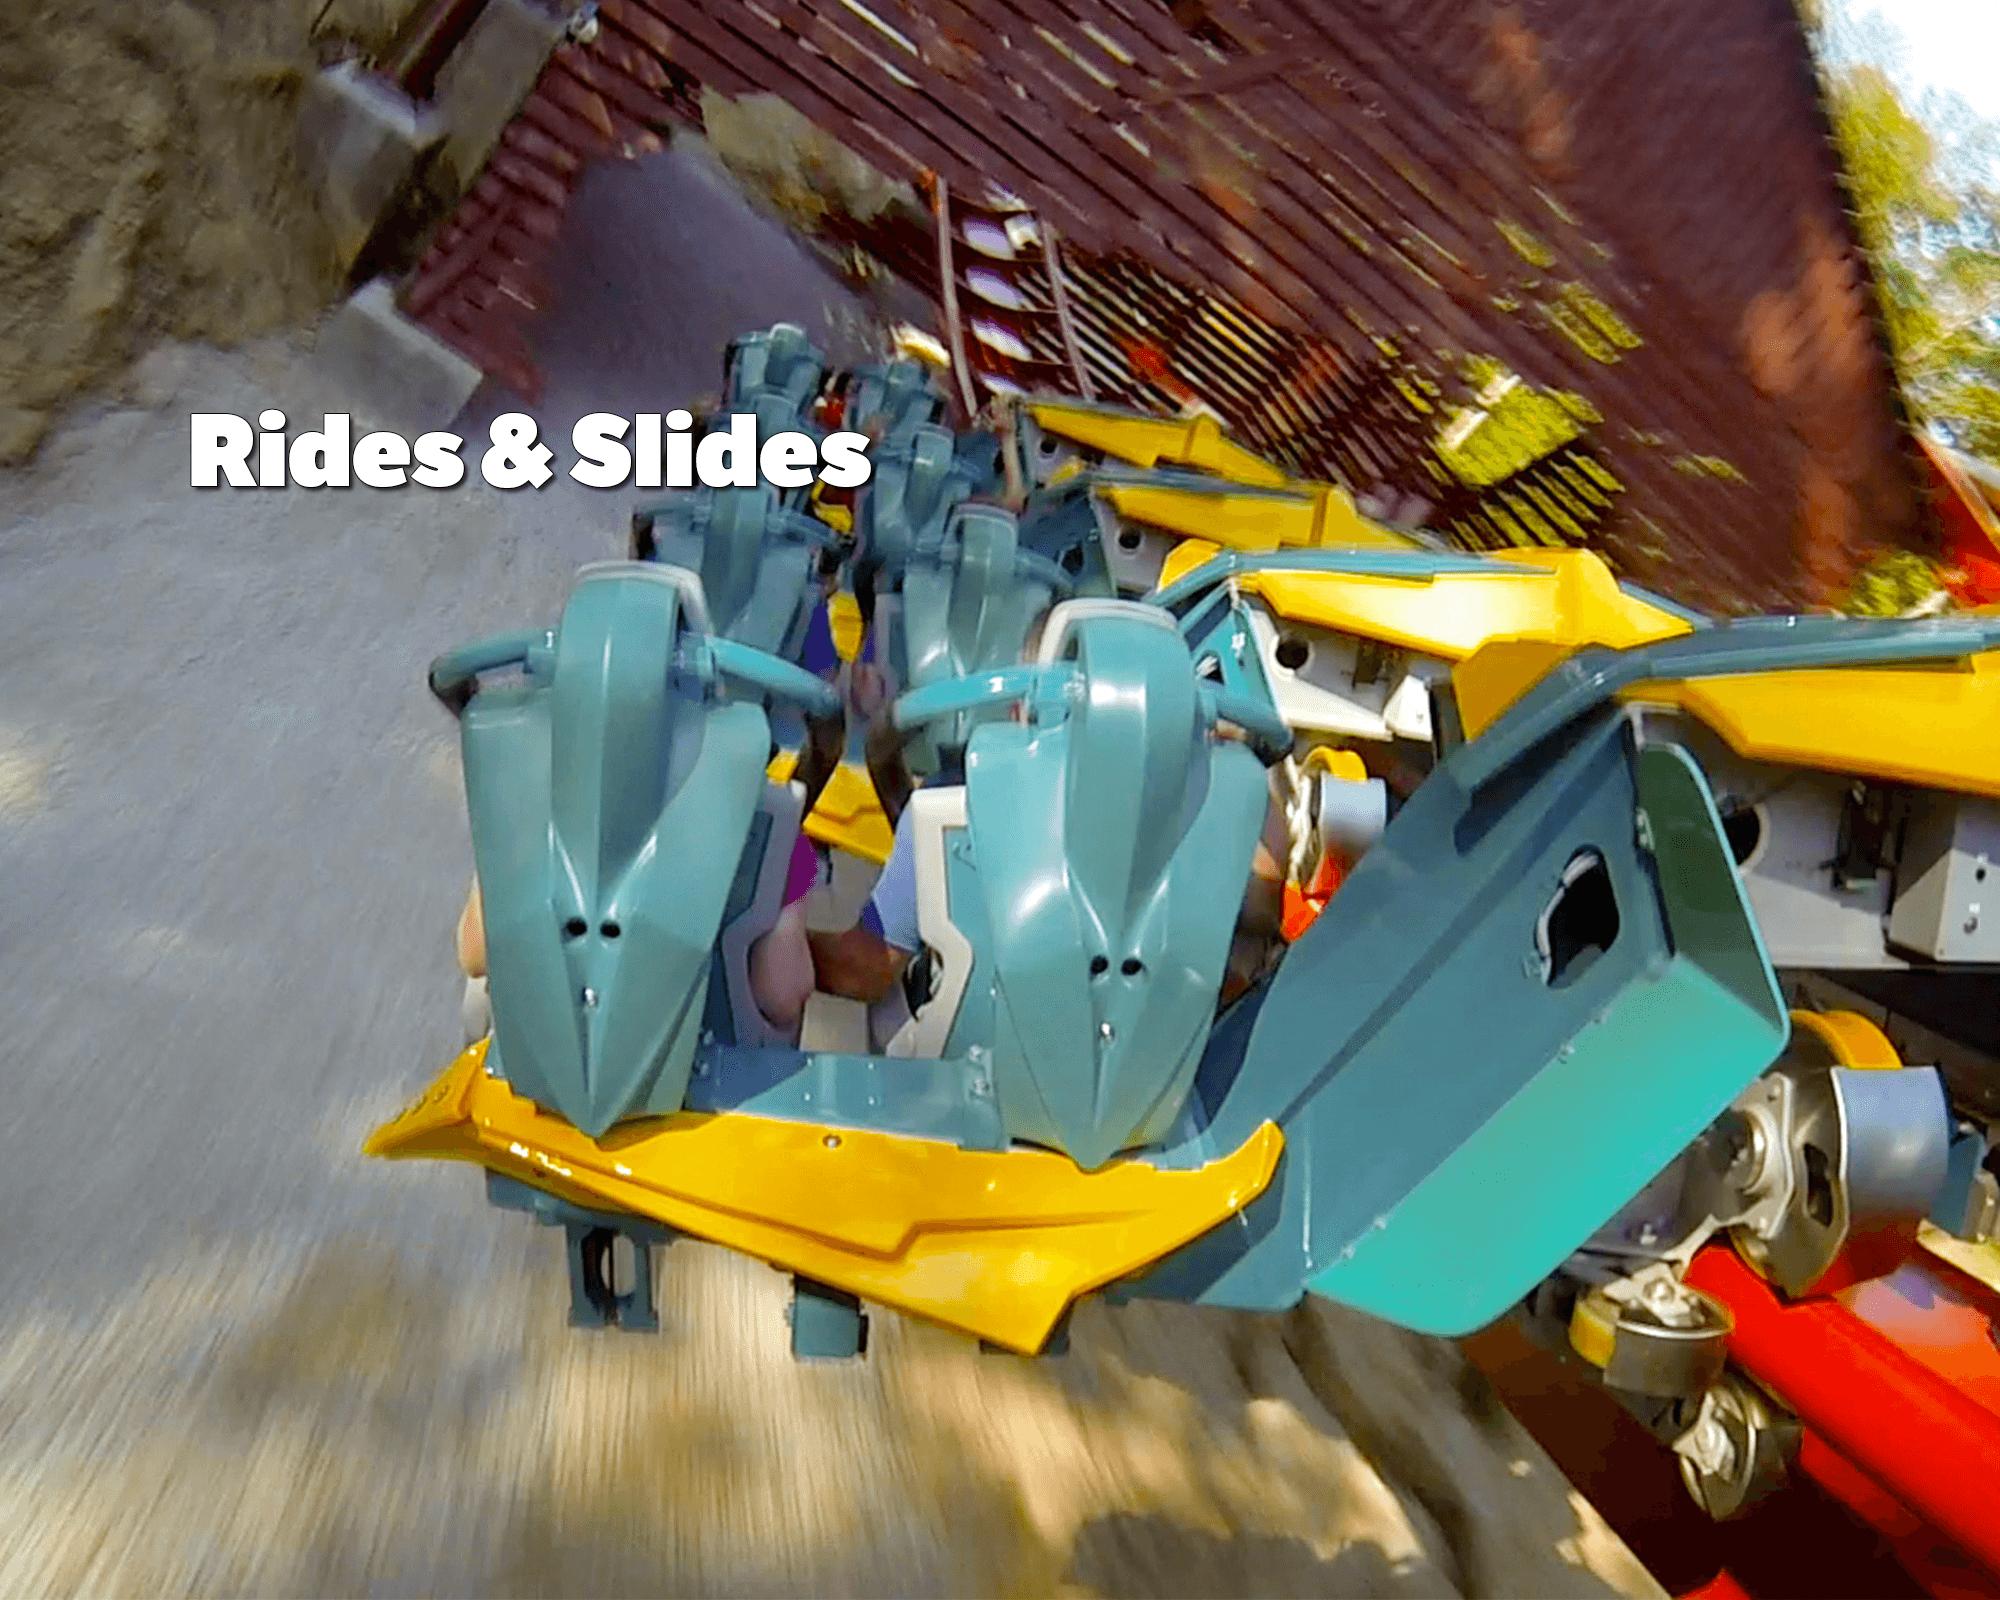 Rides & Slides | Holiday World & Splashin' Safari